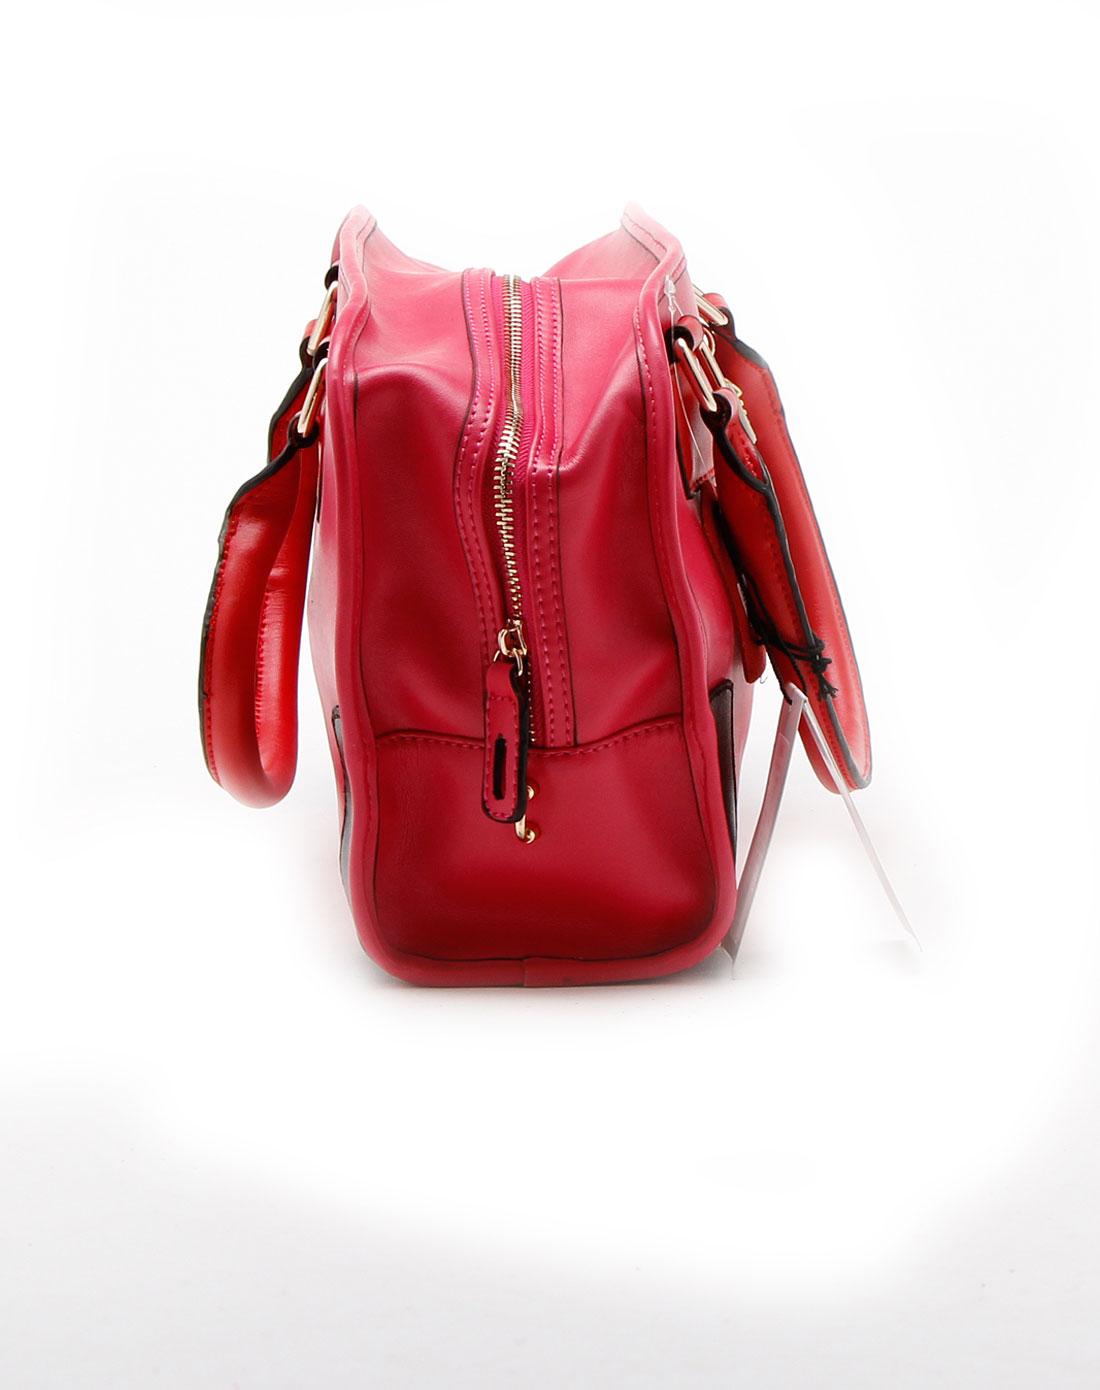 spade时尚玫红色手提包q7331